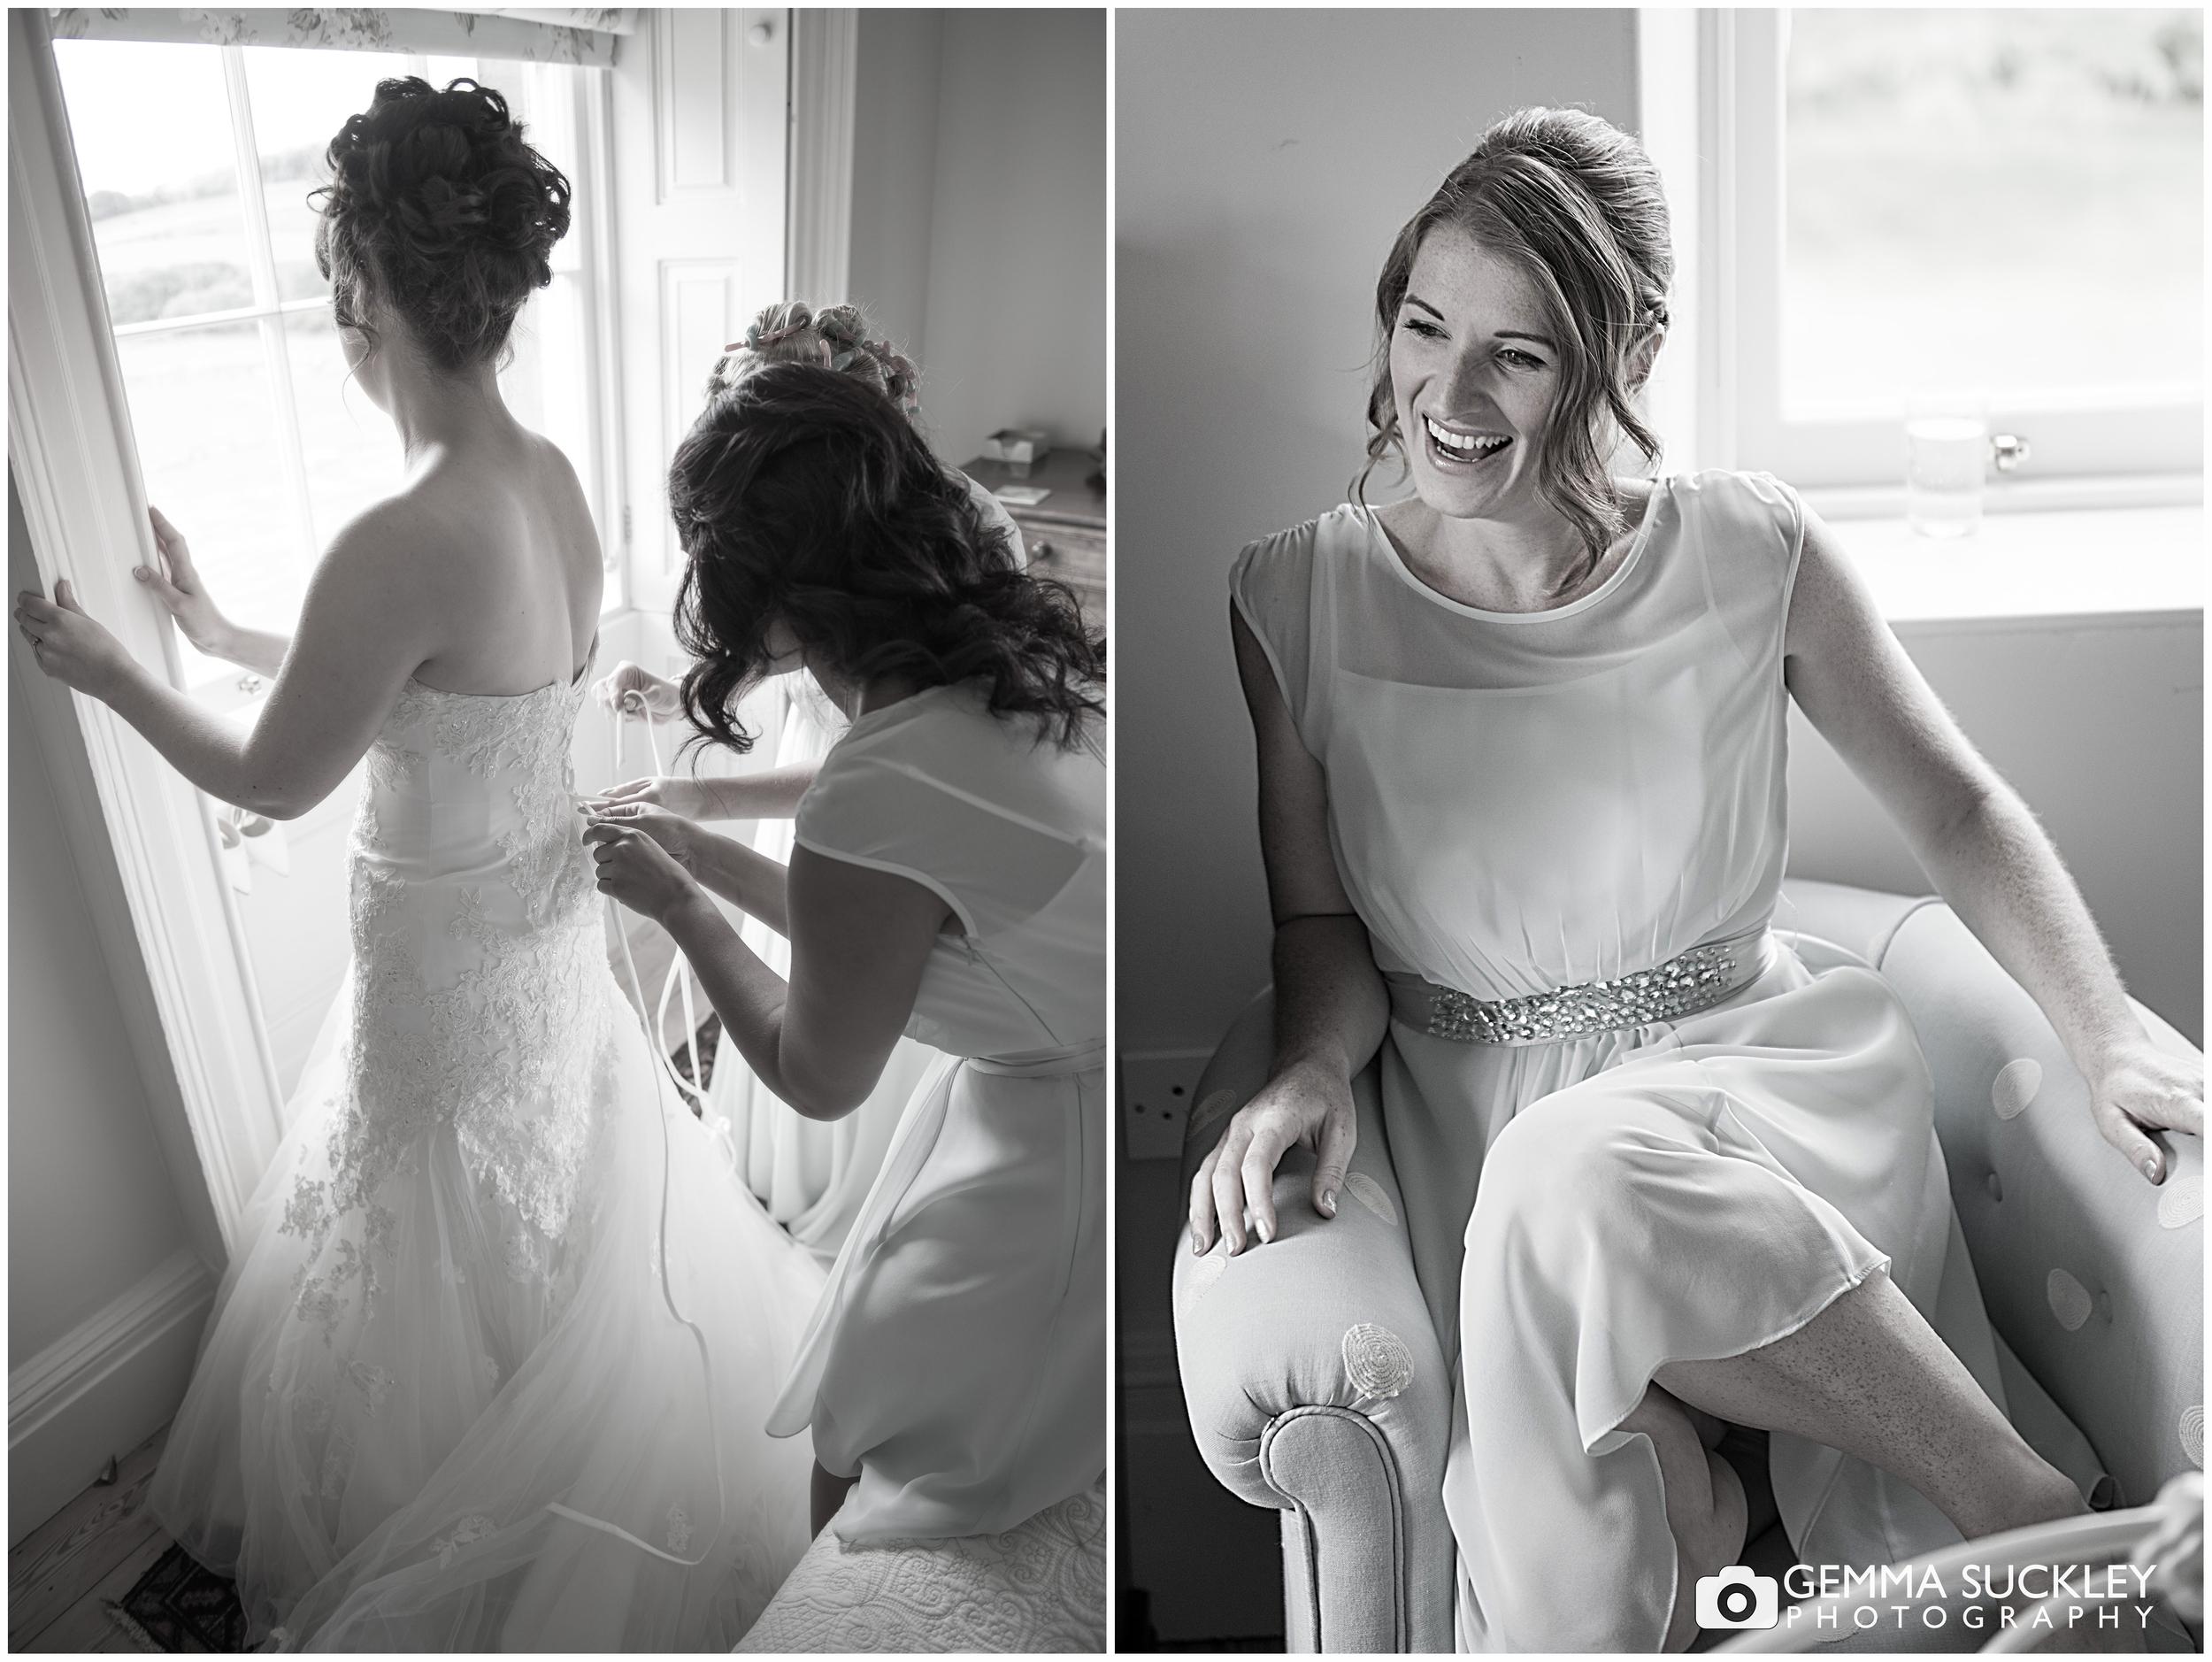 wedding-dress-gemma-uckley-photography.jpg